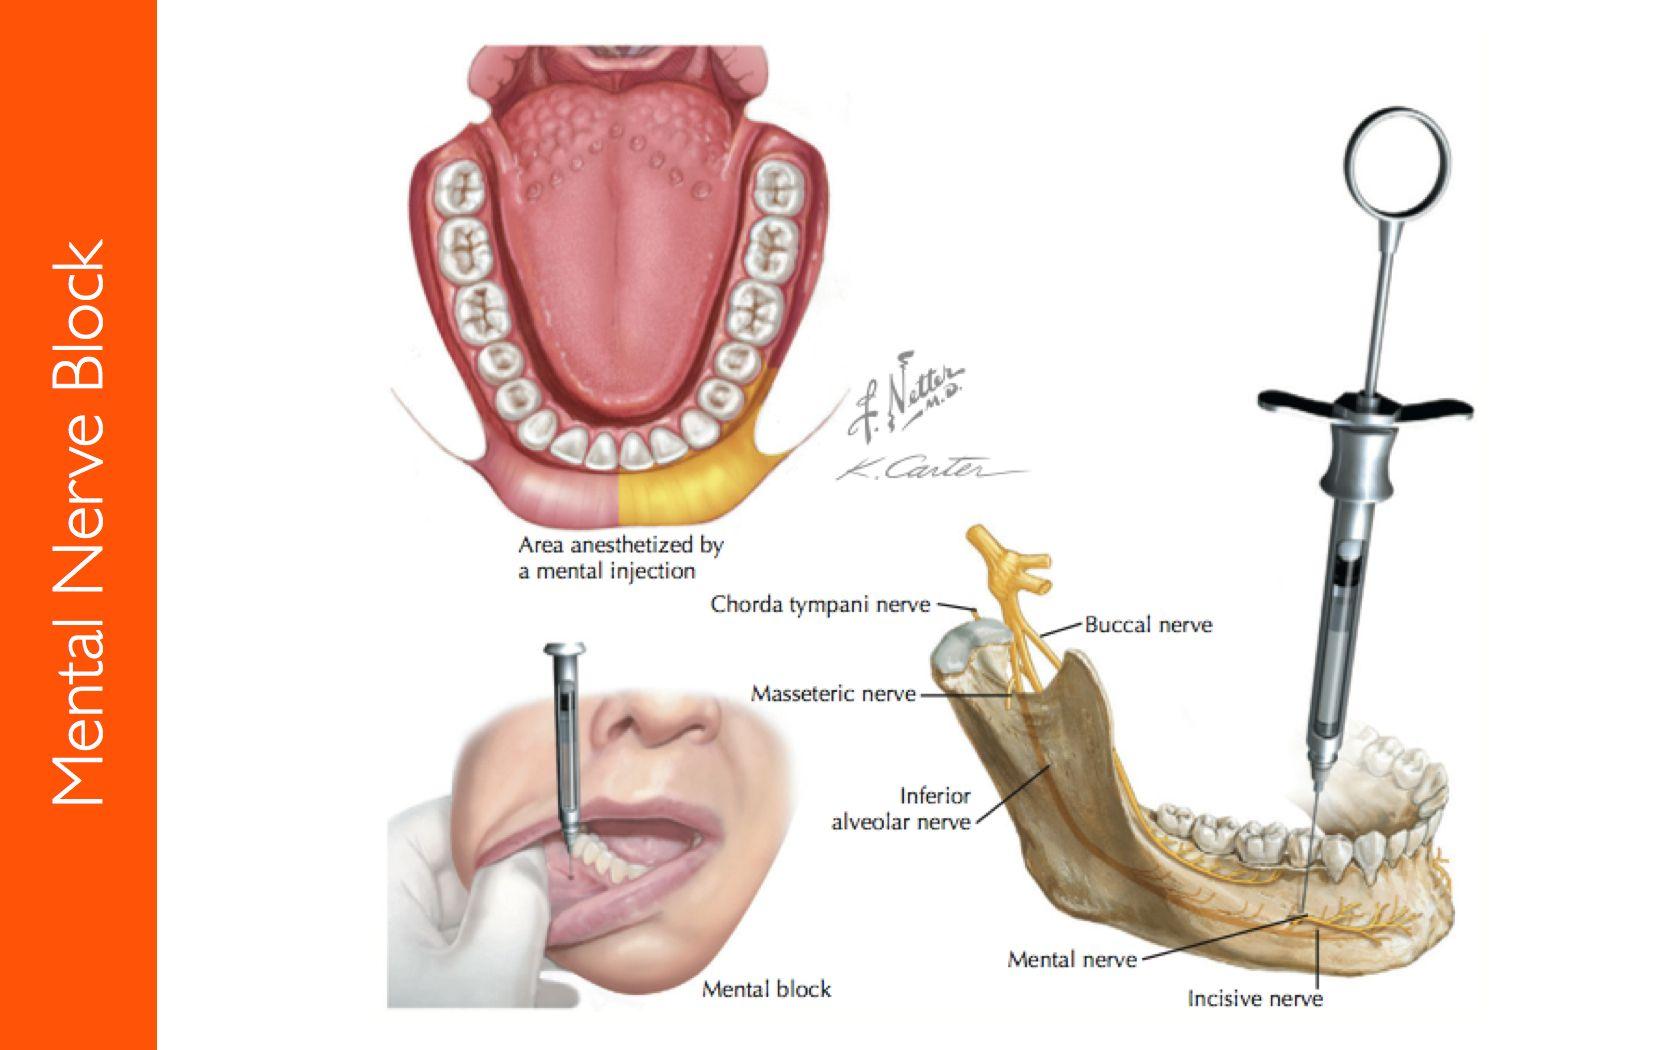 mandibular-nerves-block-3.jpg 1,680×1,050 pixels | Local Anesthesia ...